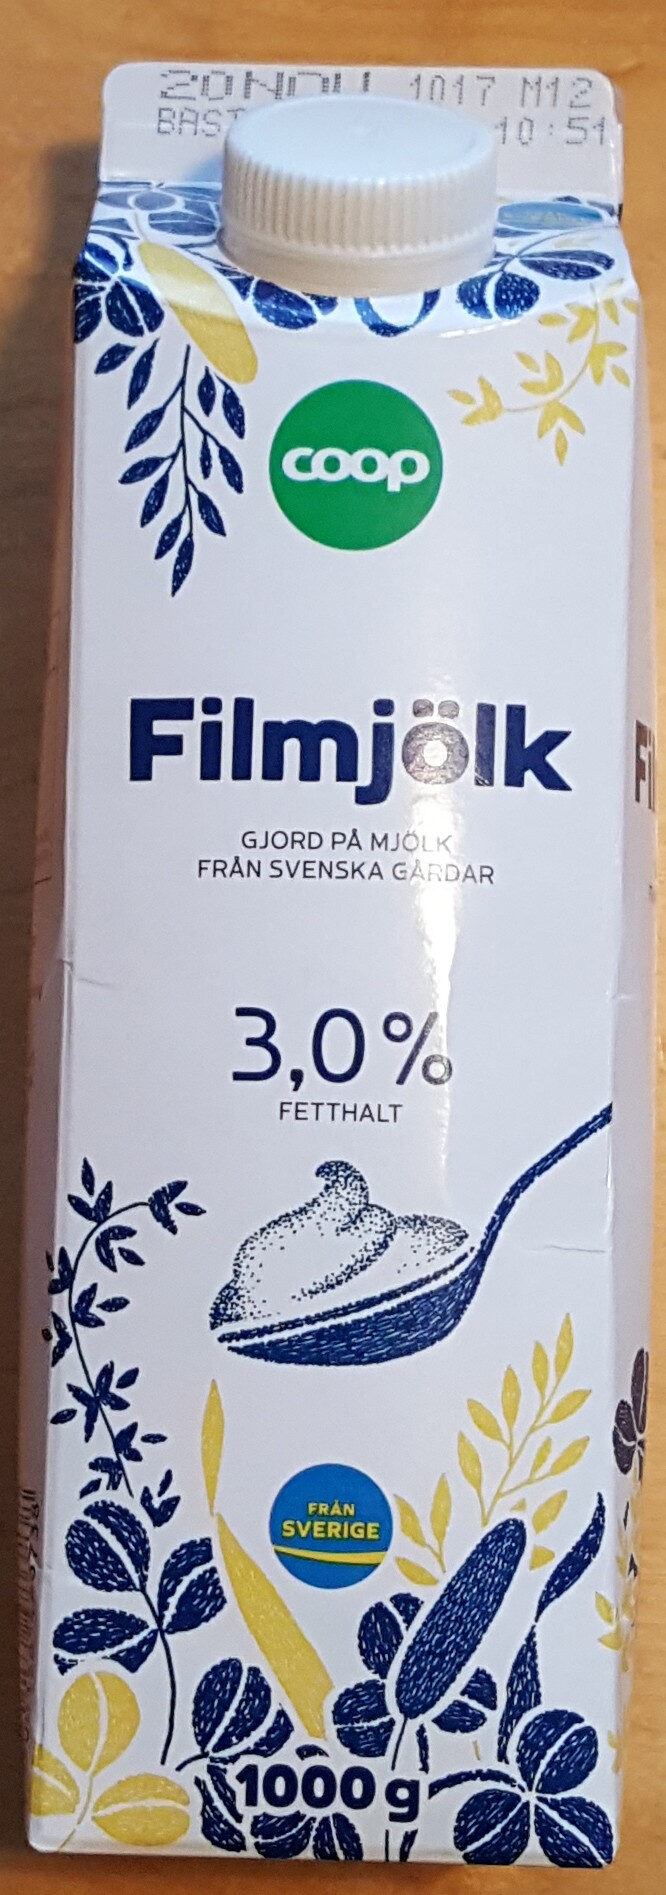 Filmjölk - Product - sv